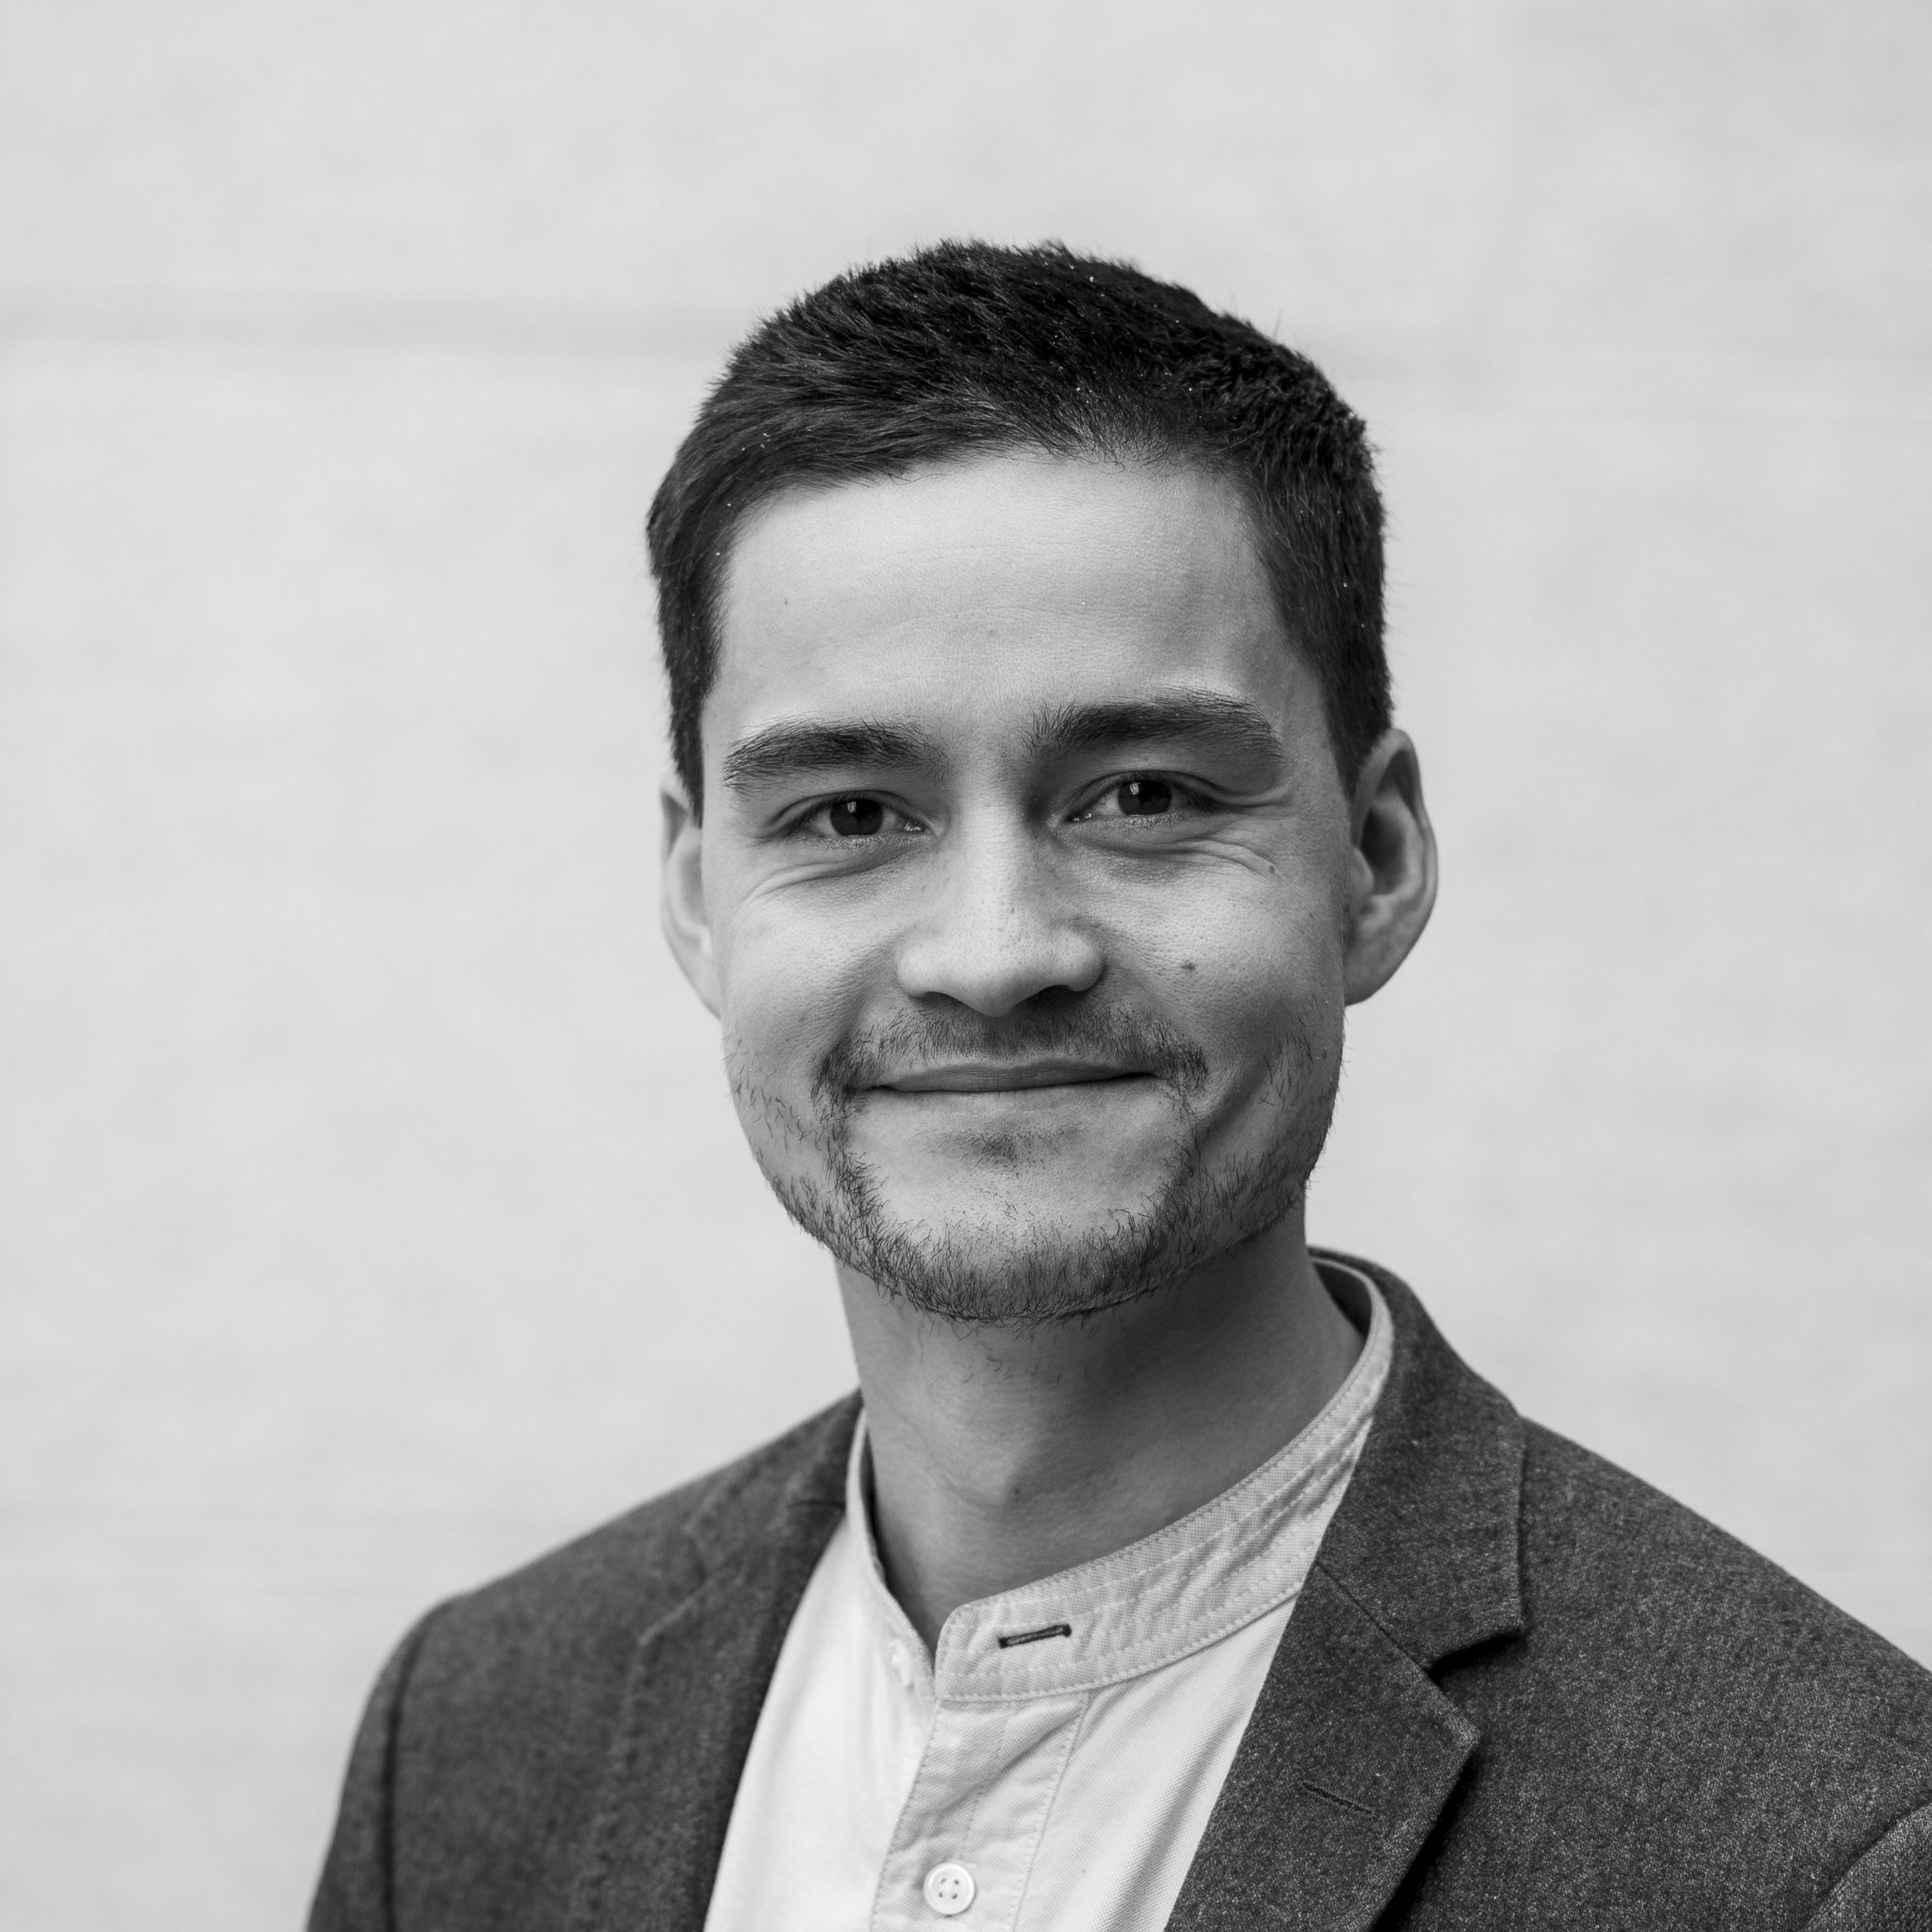 Kai Stiberg - profilbilde